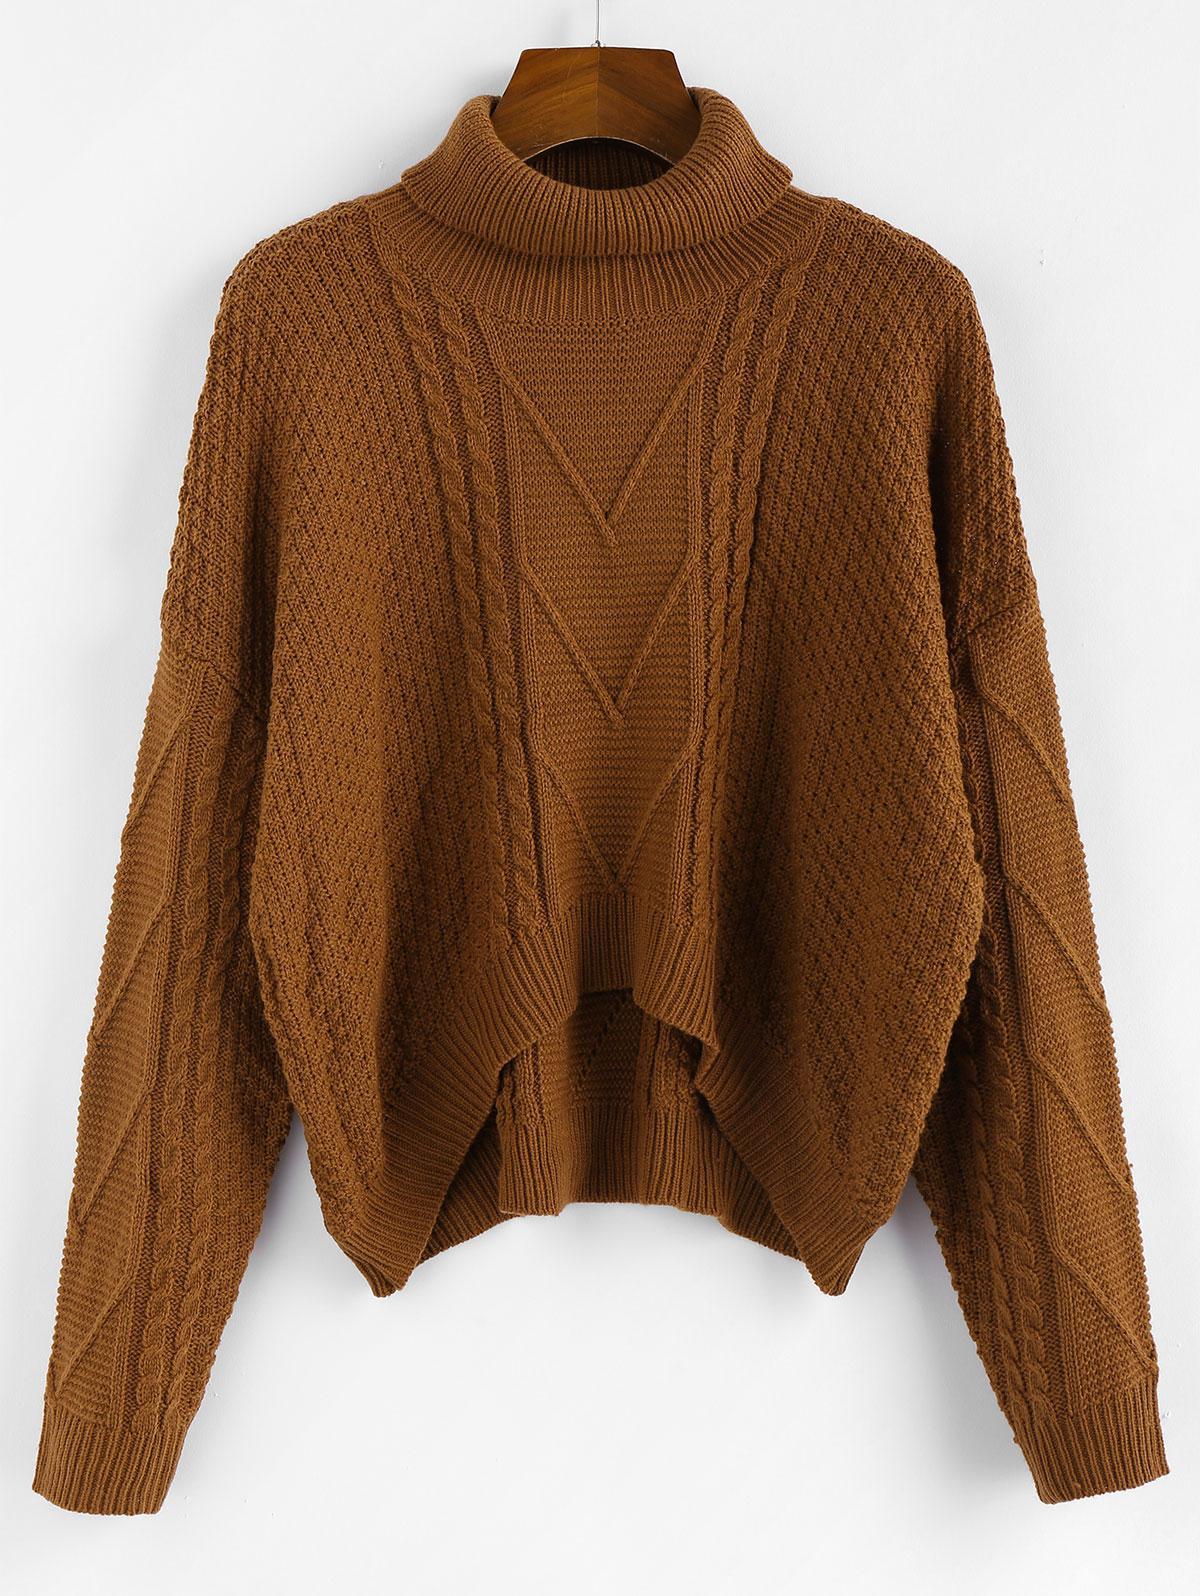 ZAFUL Drop Shoulder High Low Turtleneck Sweater фото